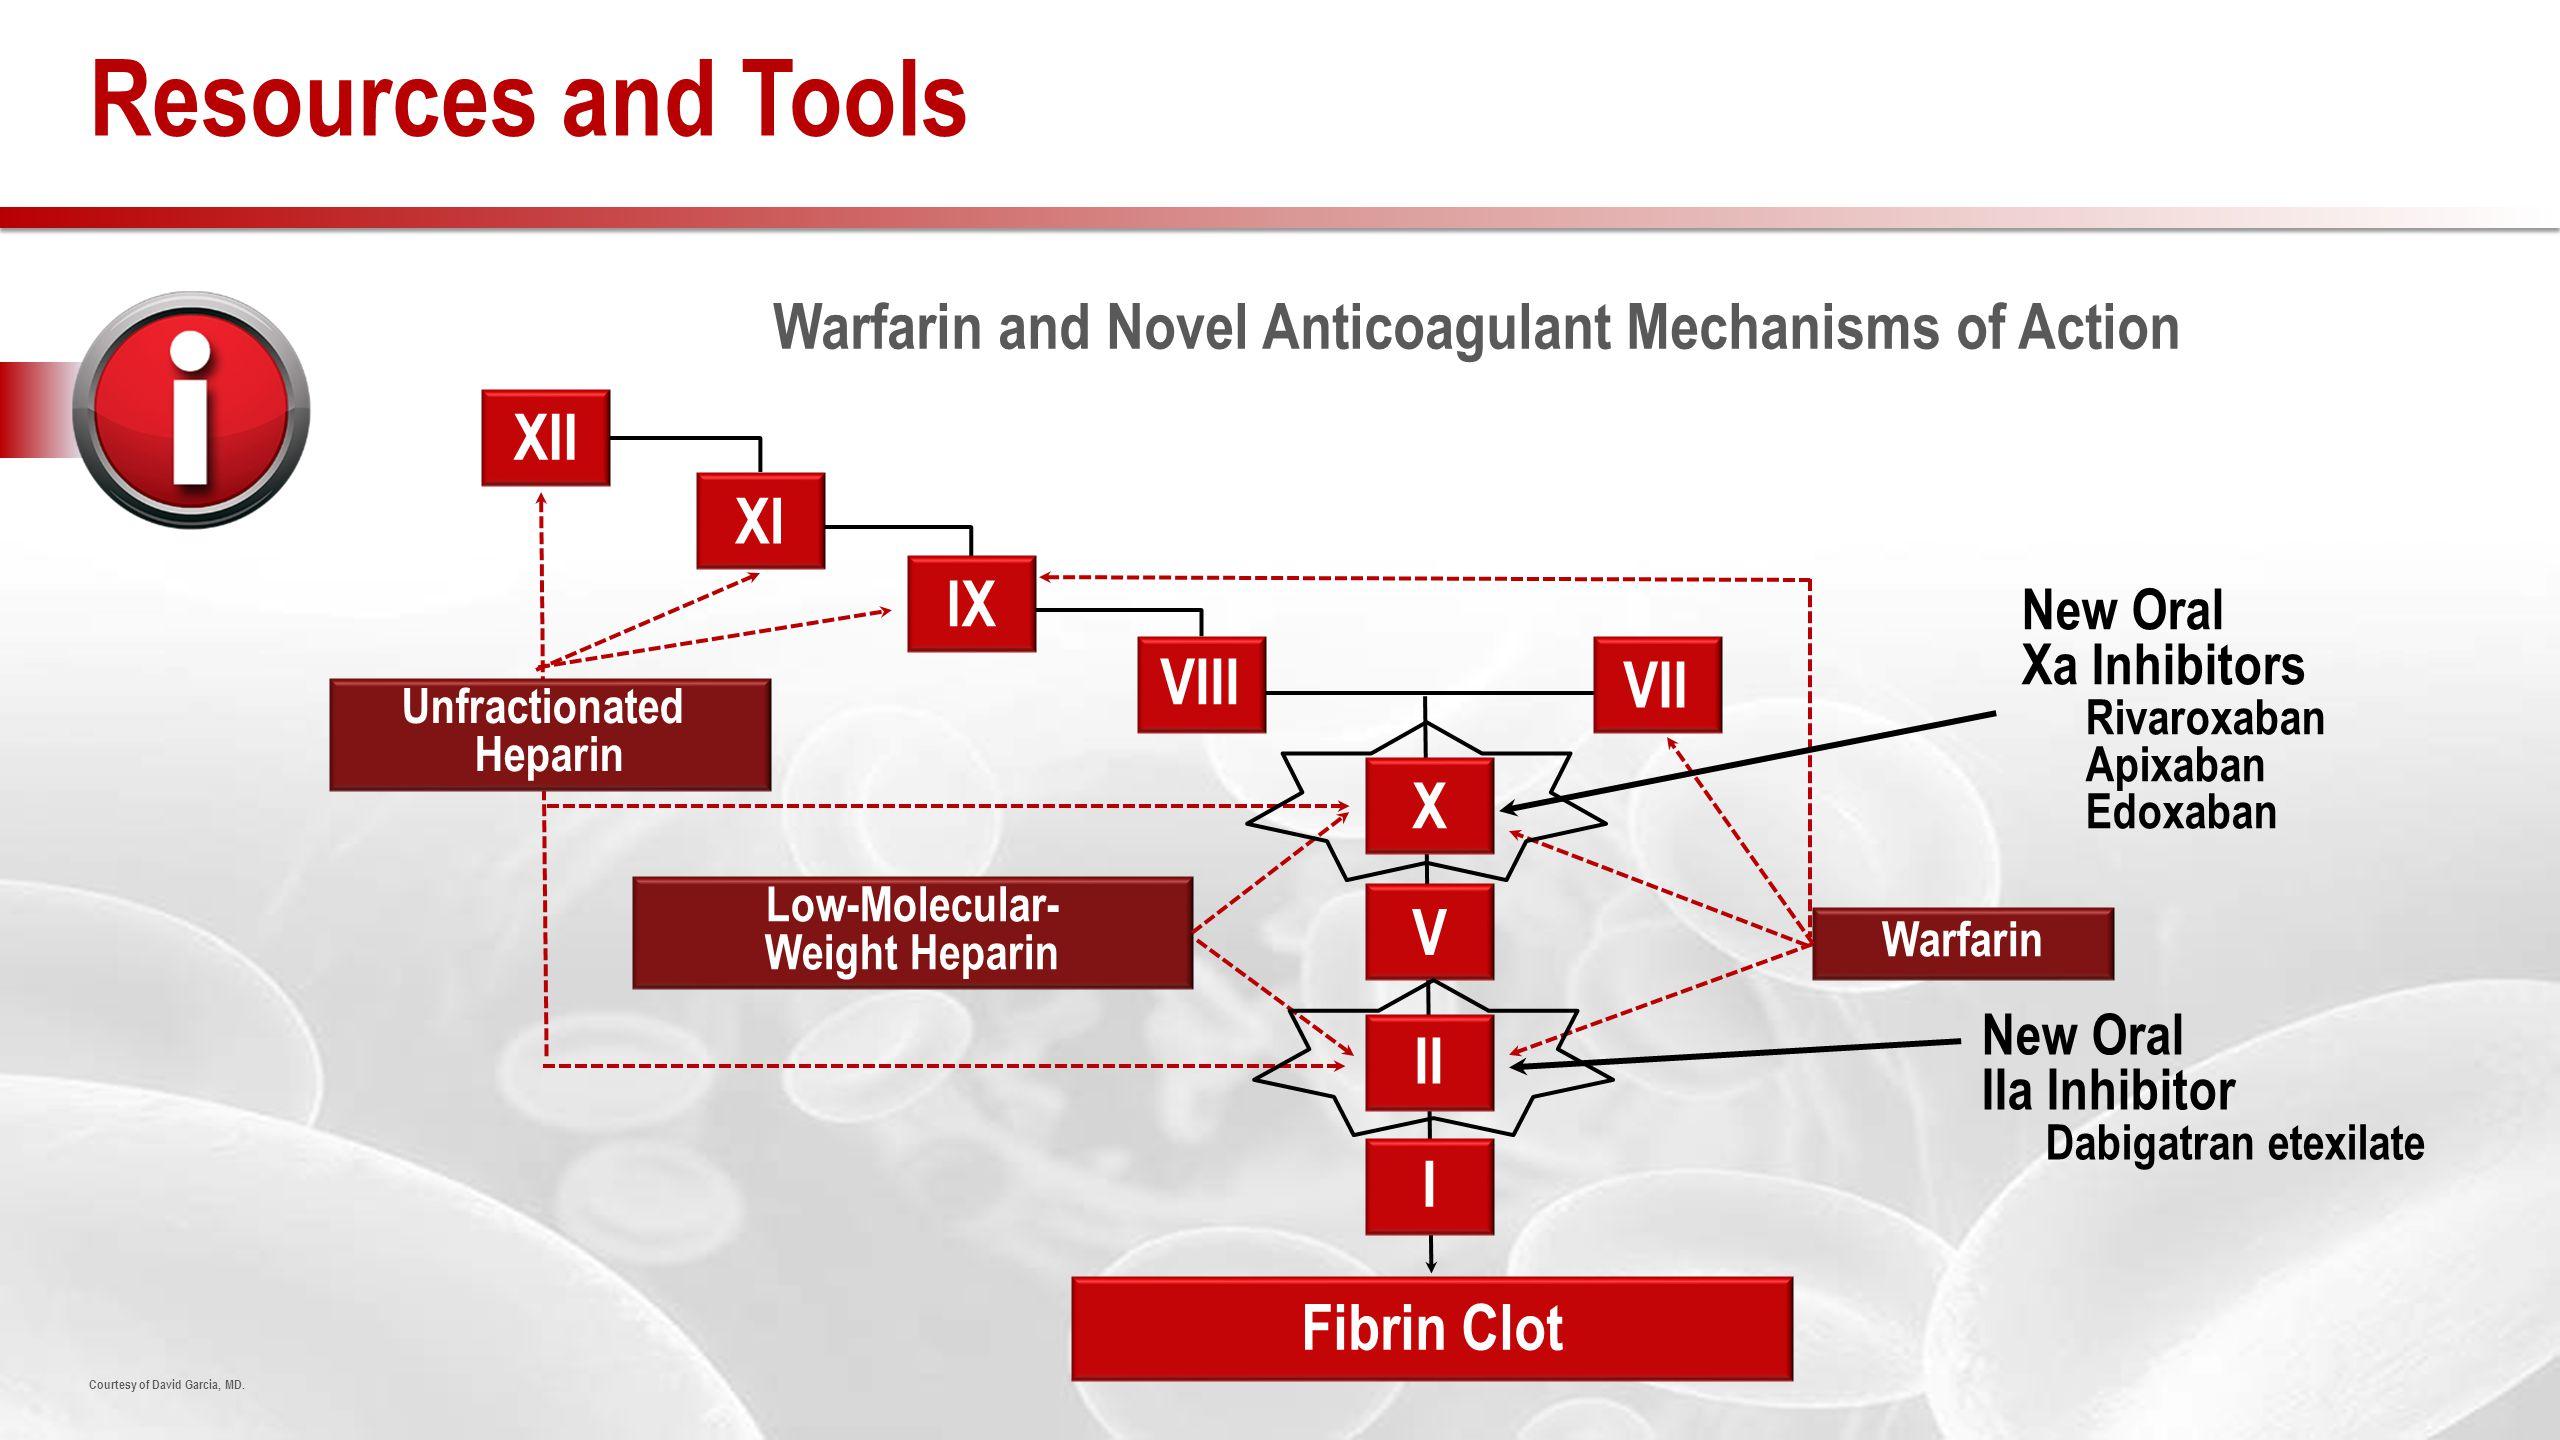 Warfarin and Novel Anticoagulant Mechanisms of Action Courtesy of David Garcia, MD.